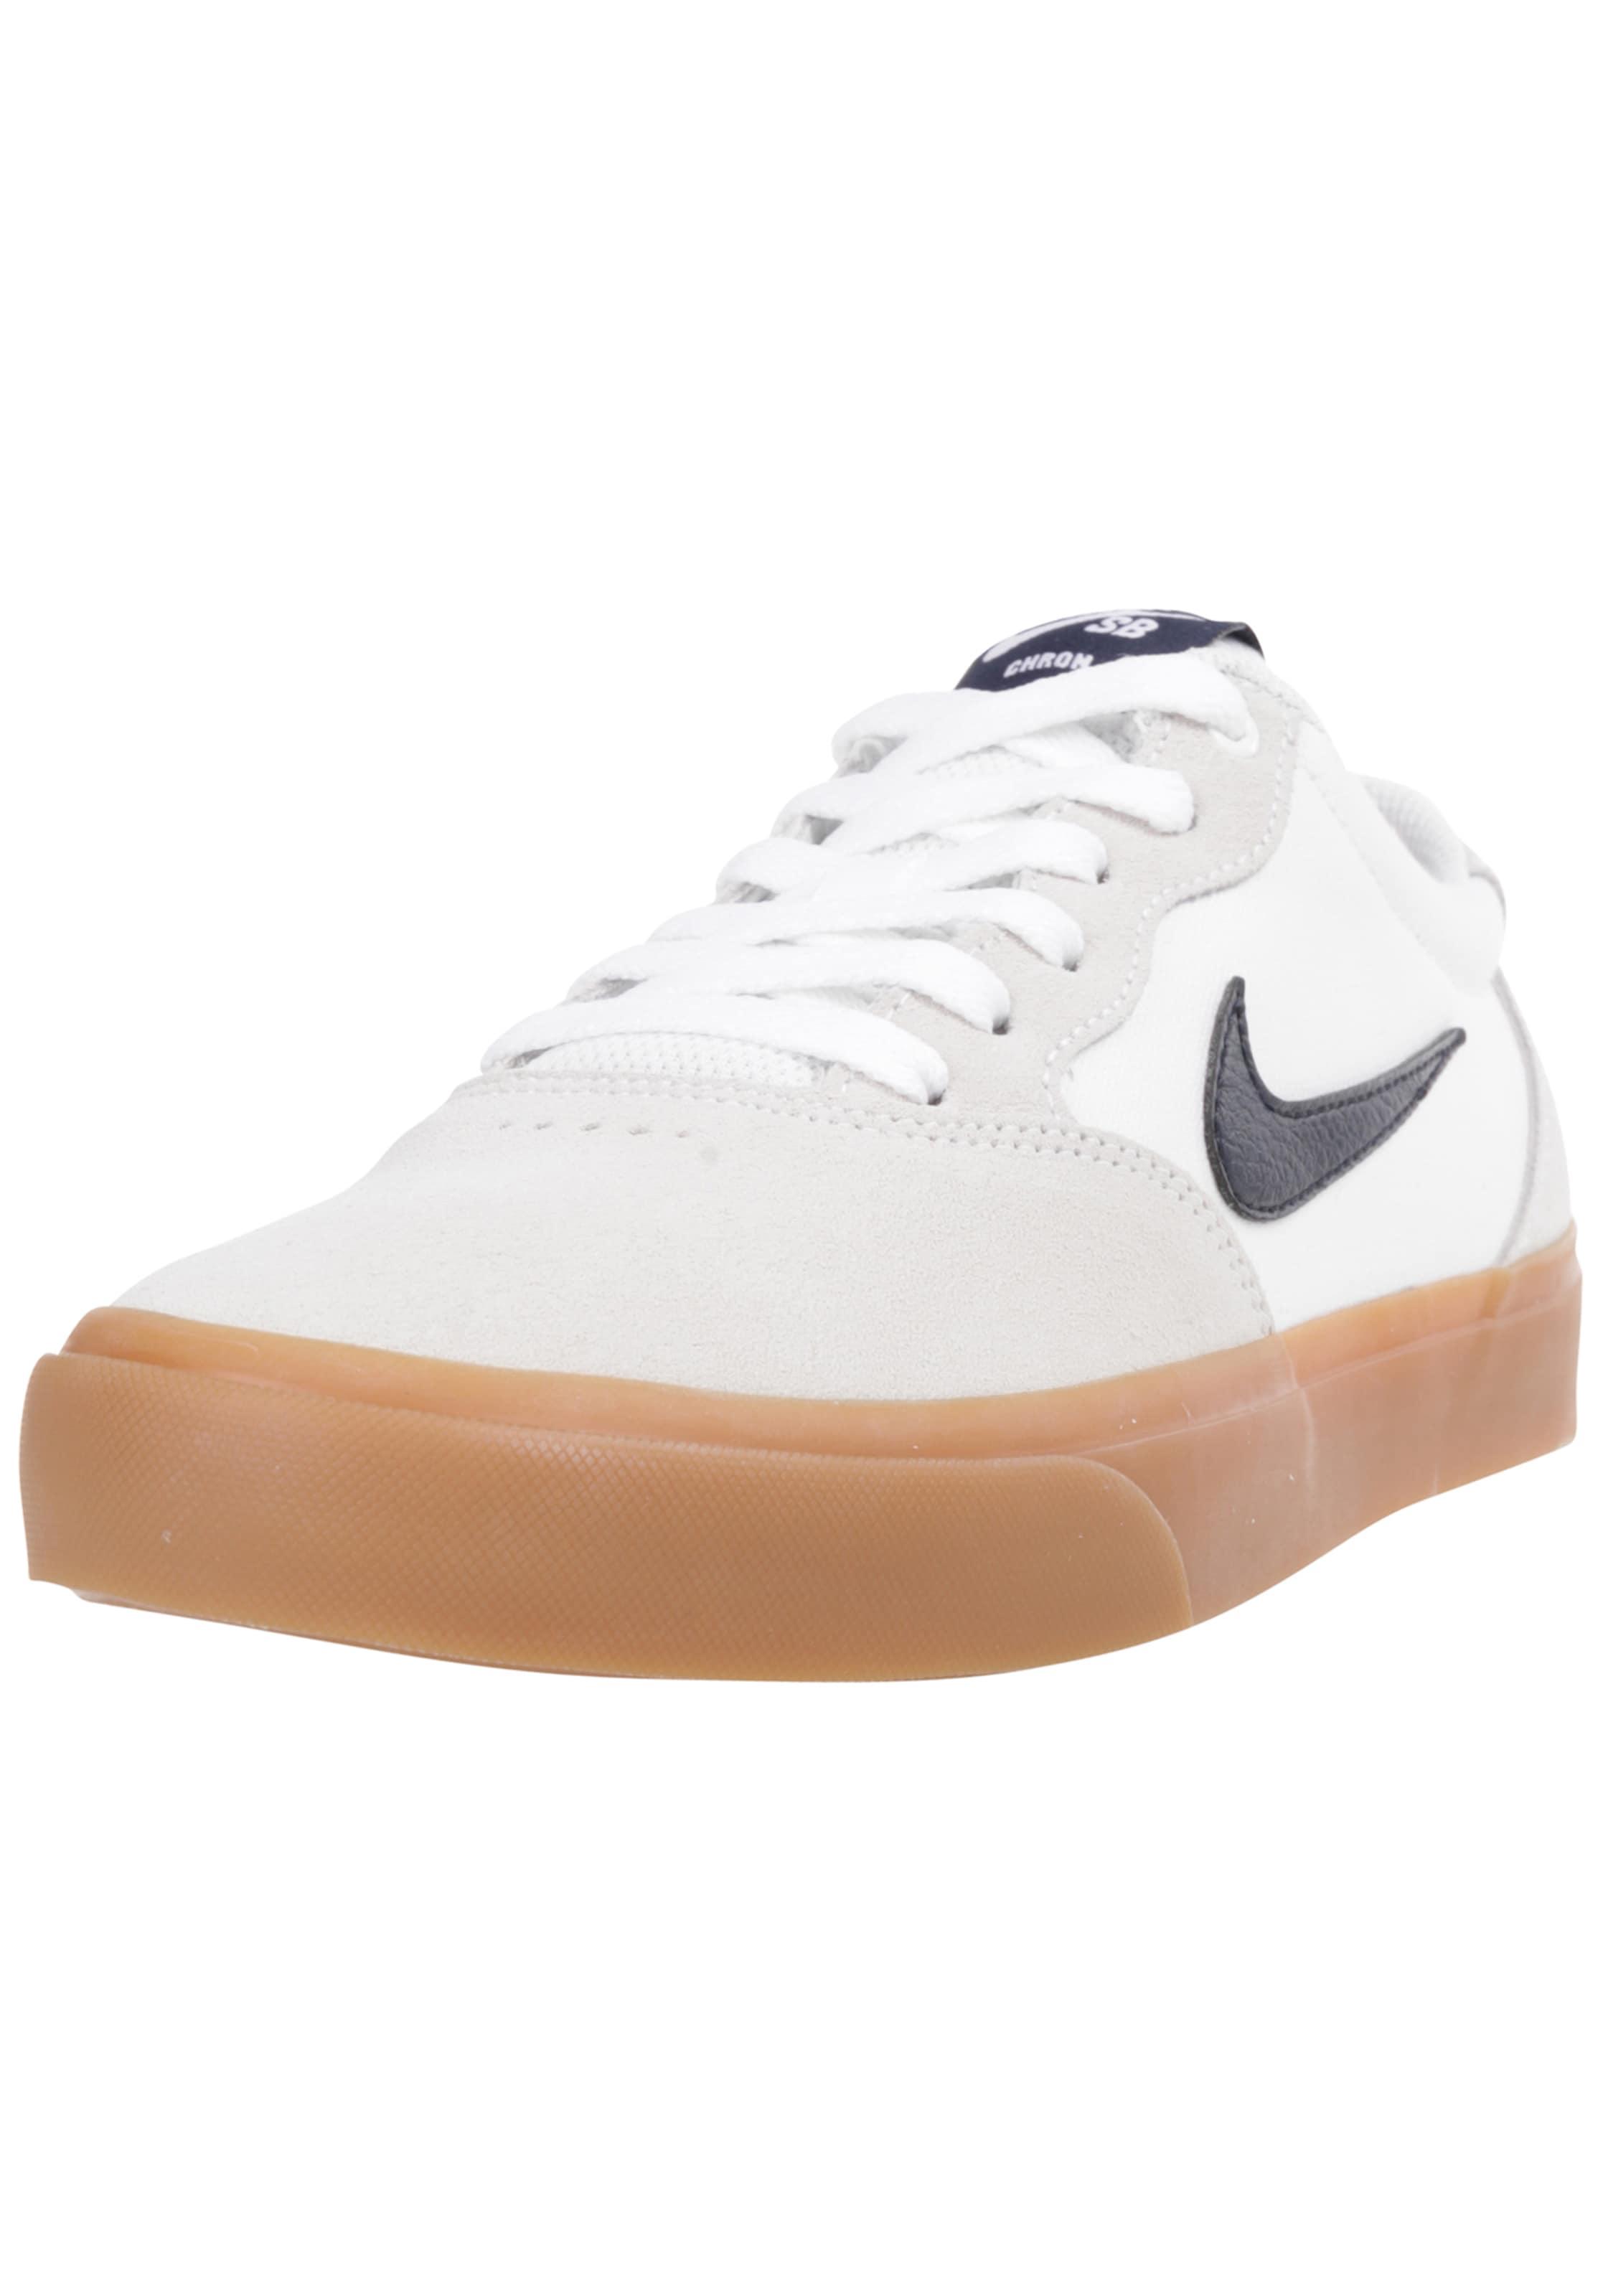 Sb 'chron' NavyHellgrau Weiß Nike Sneaker In UMSzVqp